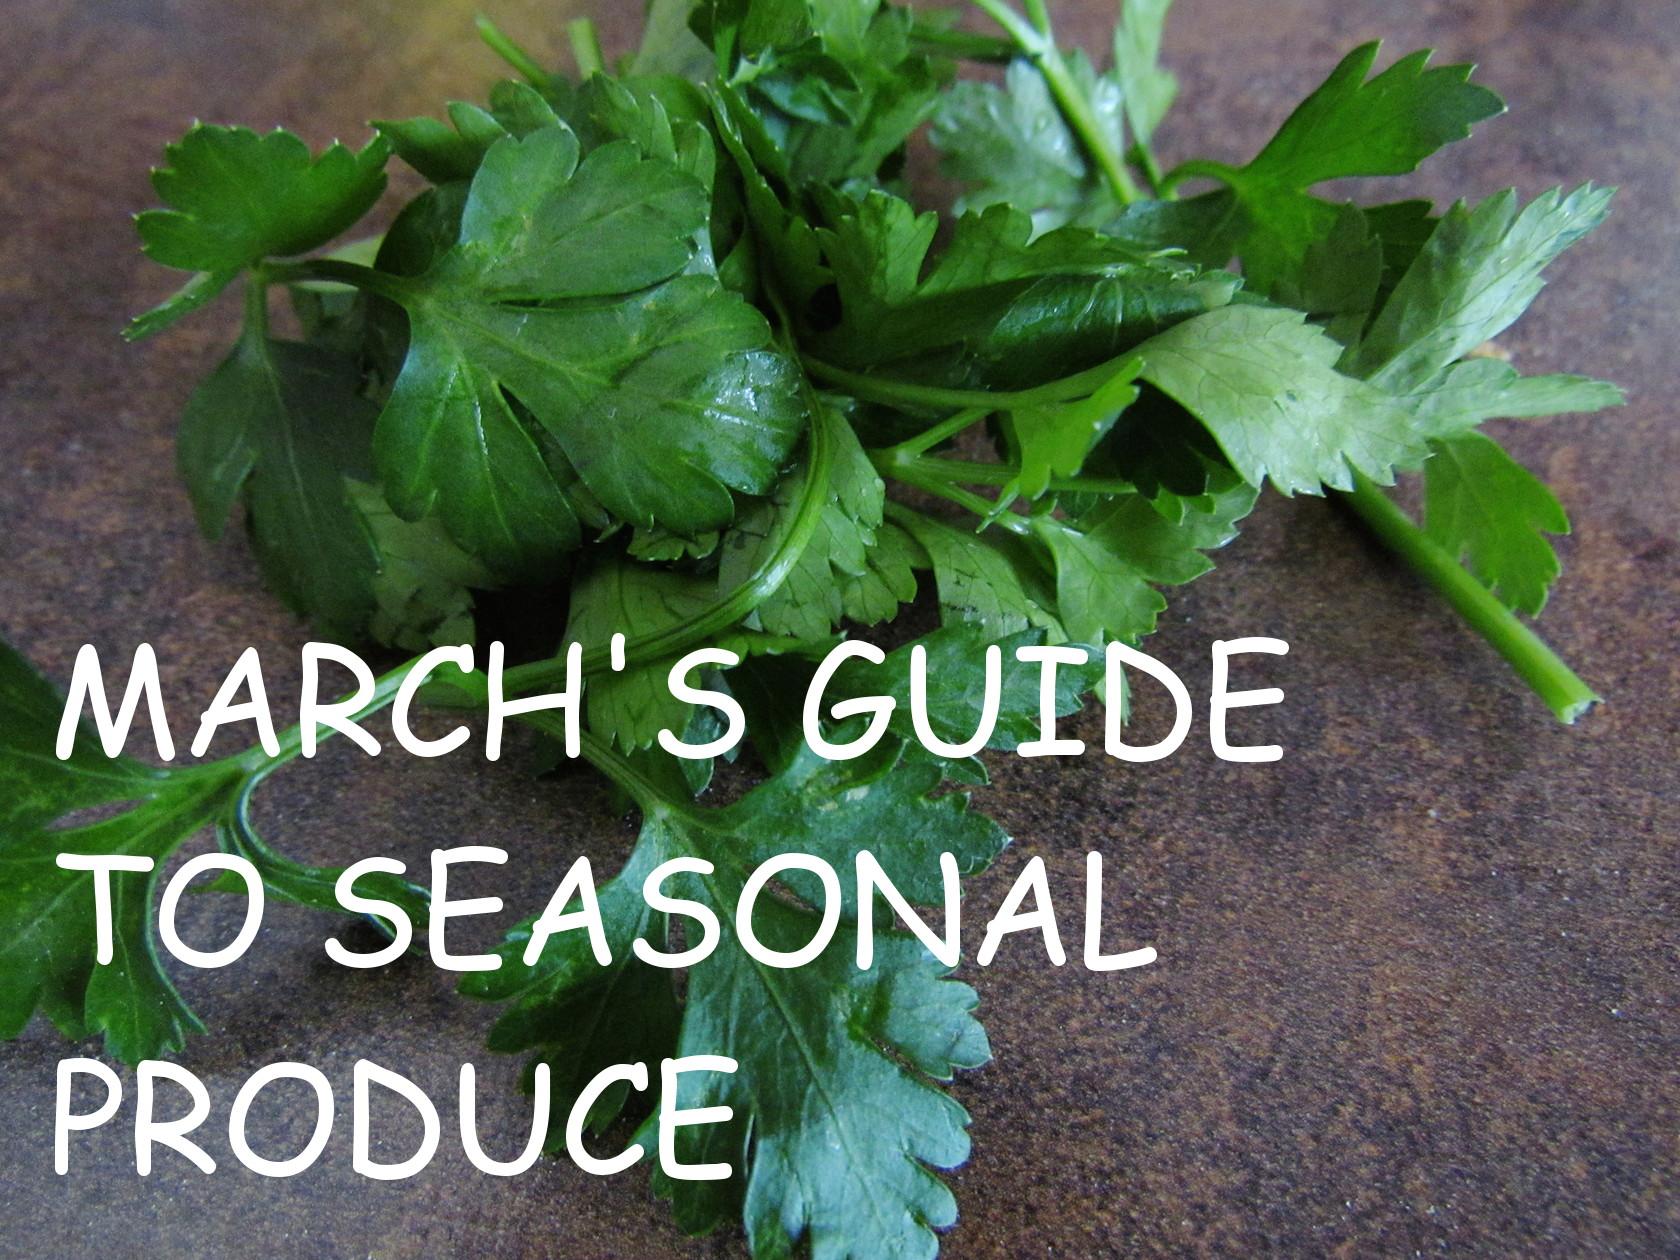 seasonal produce guide for switzerland: march